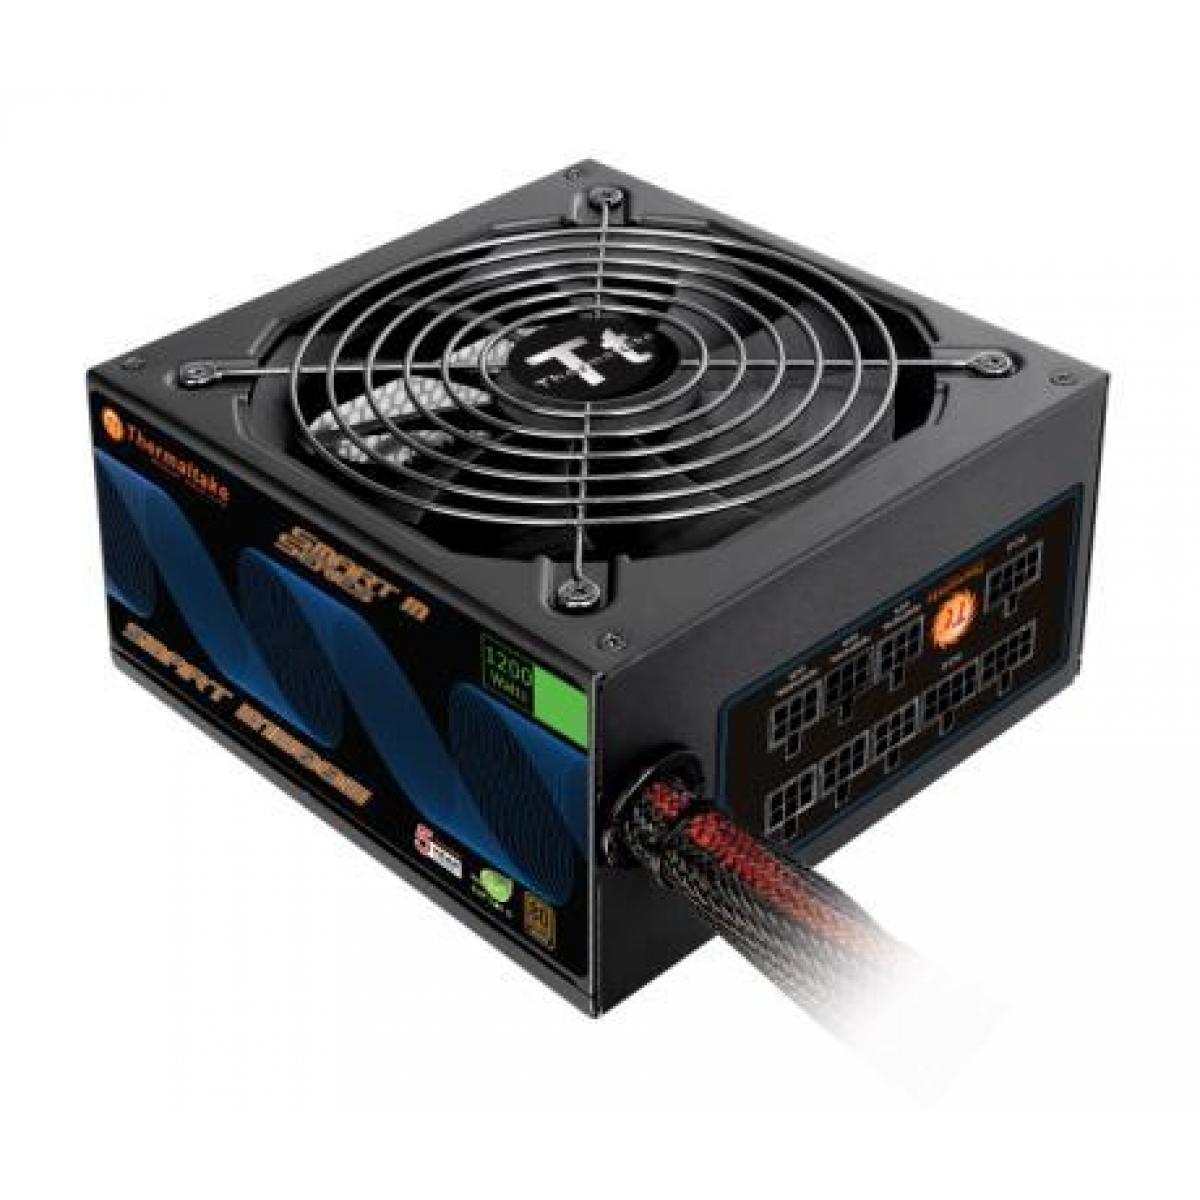 Fonte Thermaltake Smart SP-1200M 1200W, 80 Plus Bronze, PFC Ativo, Semi Modular, SP-1200M